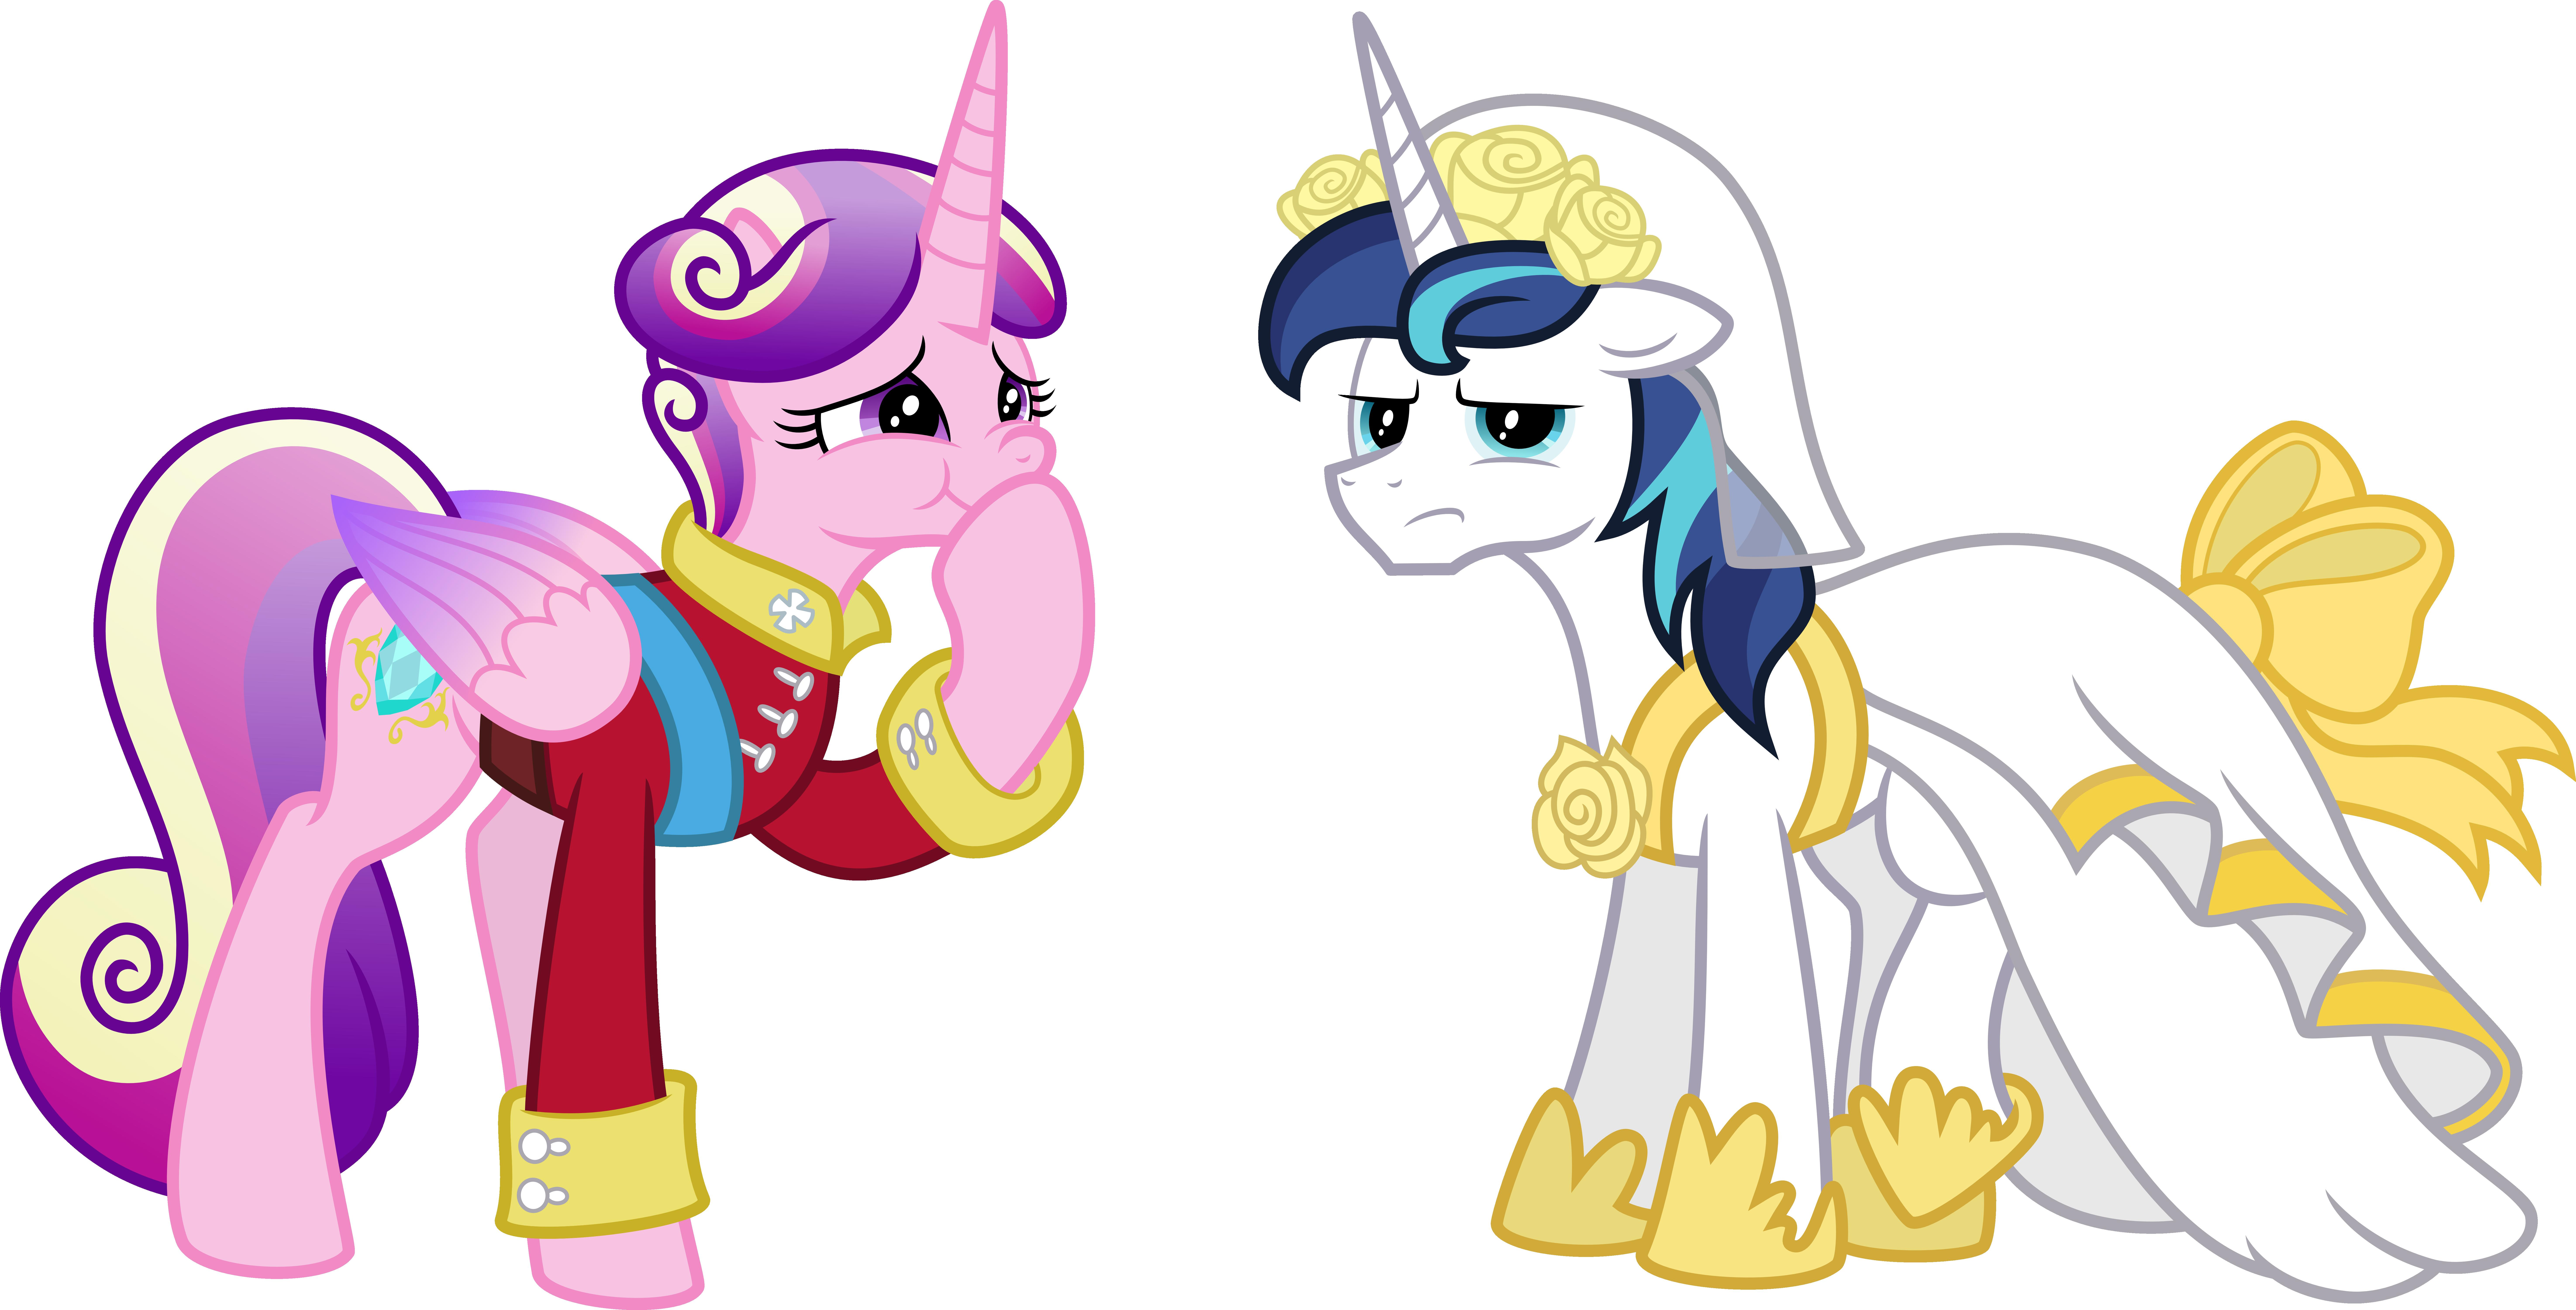 Rarity Pony Rainbow Dash Princess Cadance Mammal Cartoon Vertebrate Fictional Character Horse Like Mythical